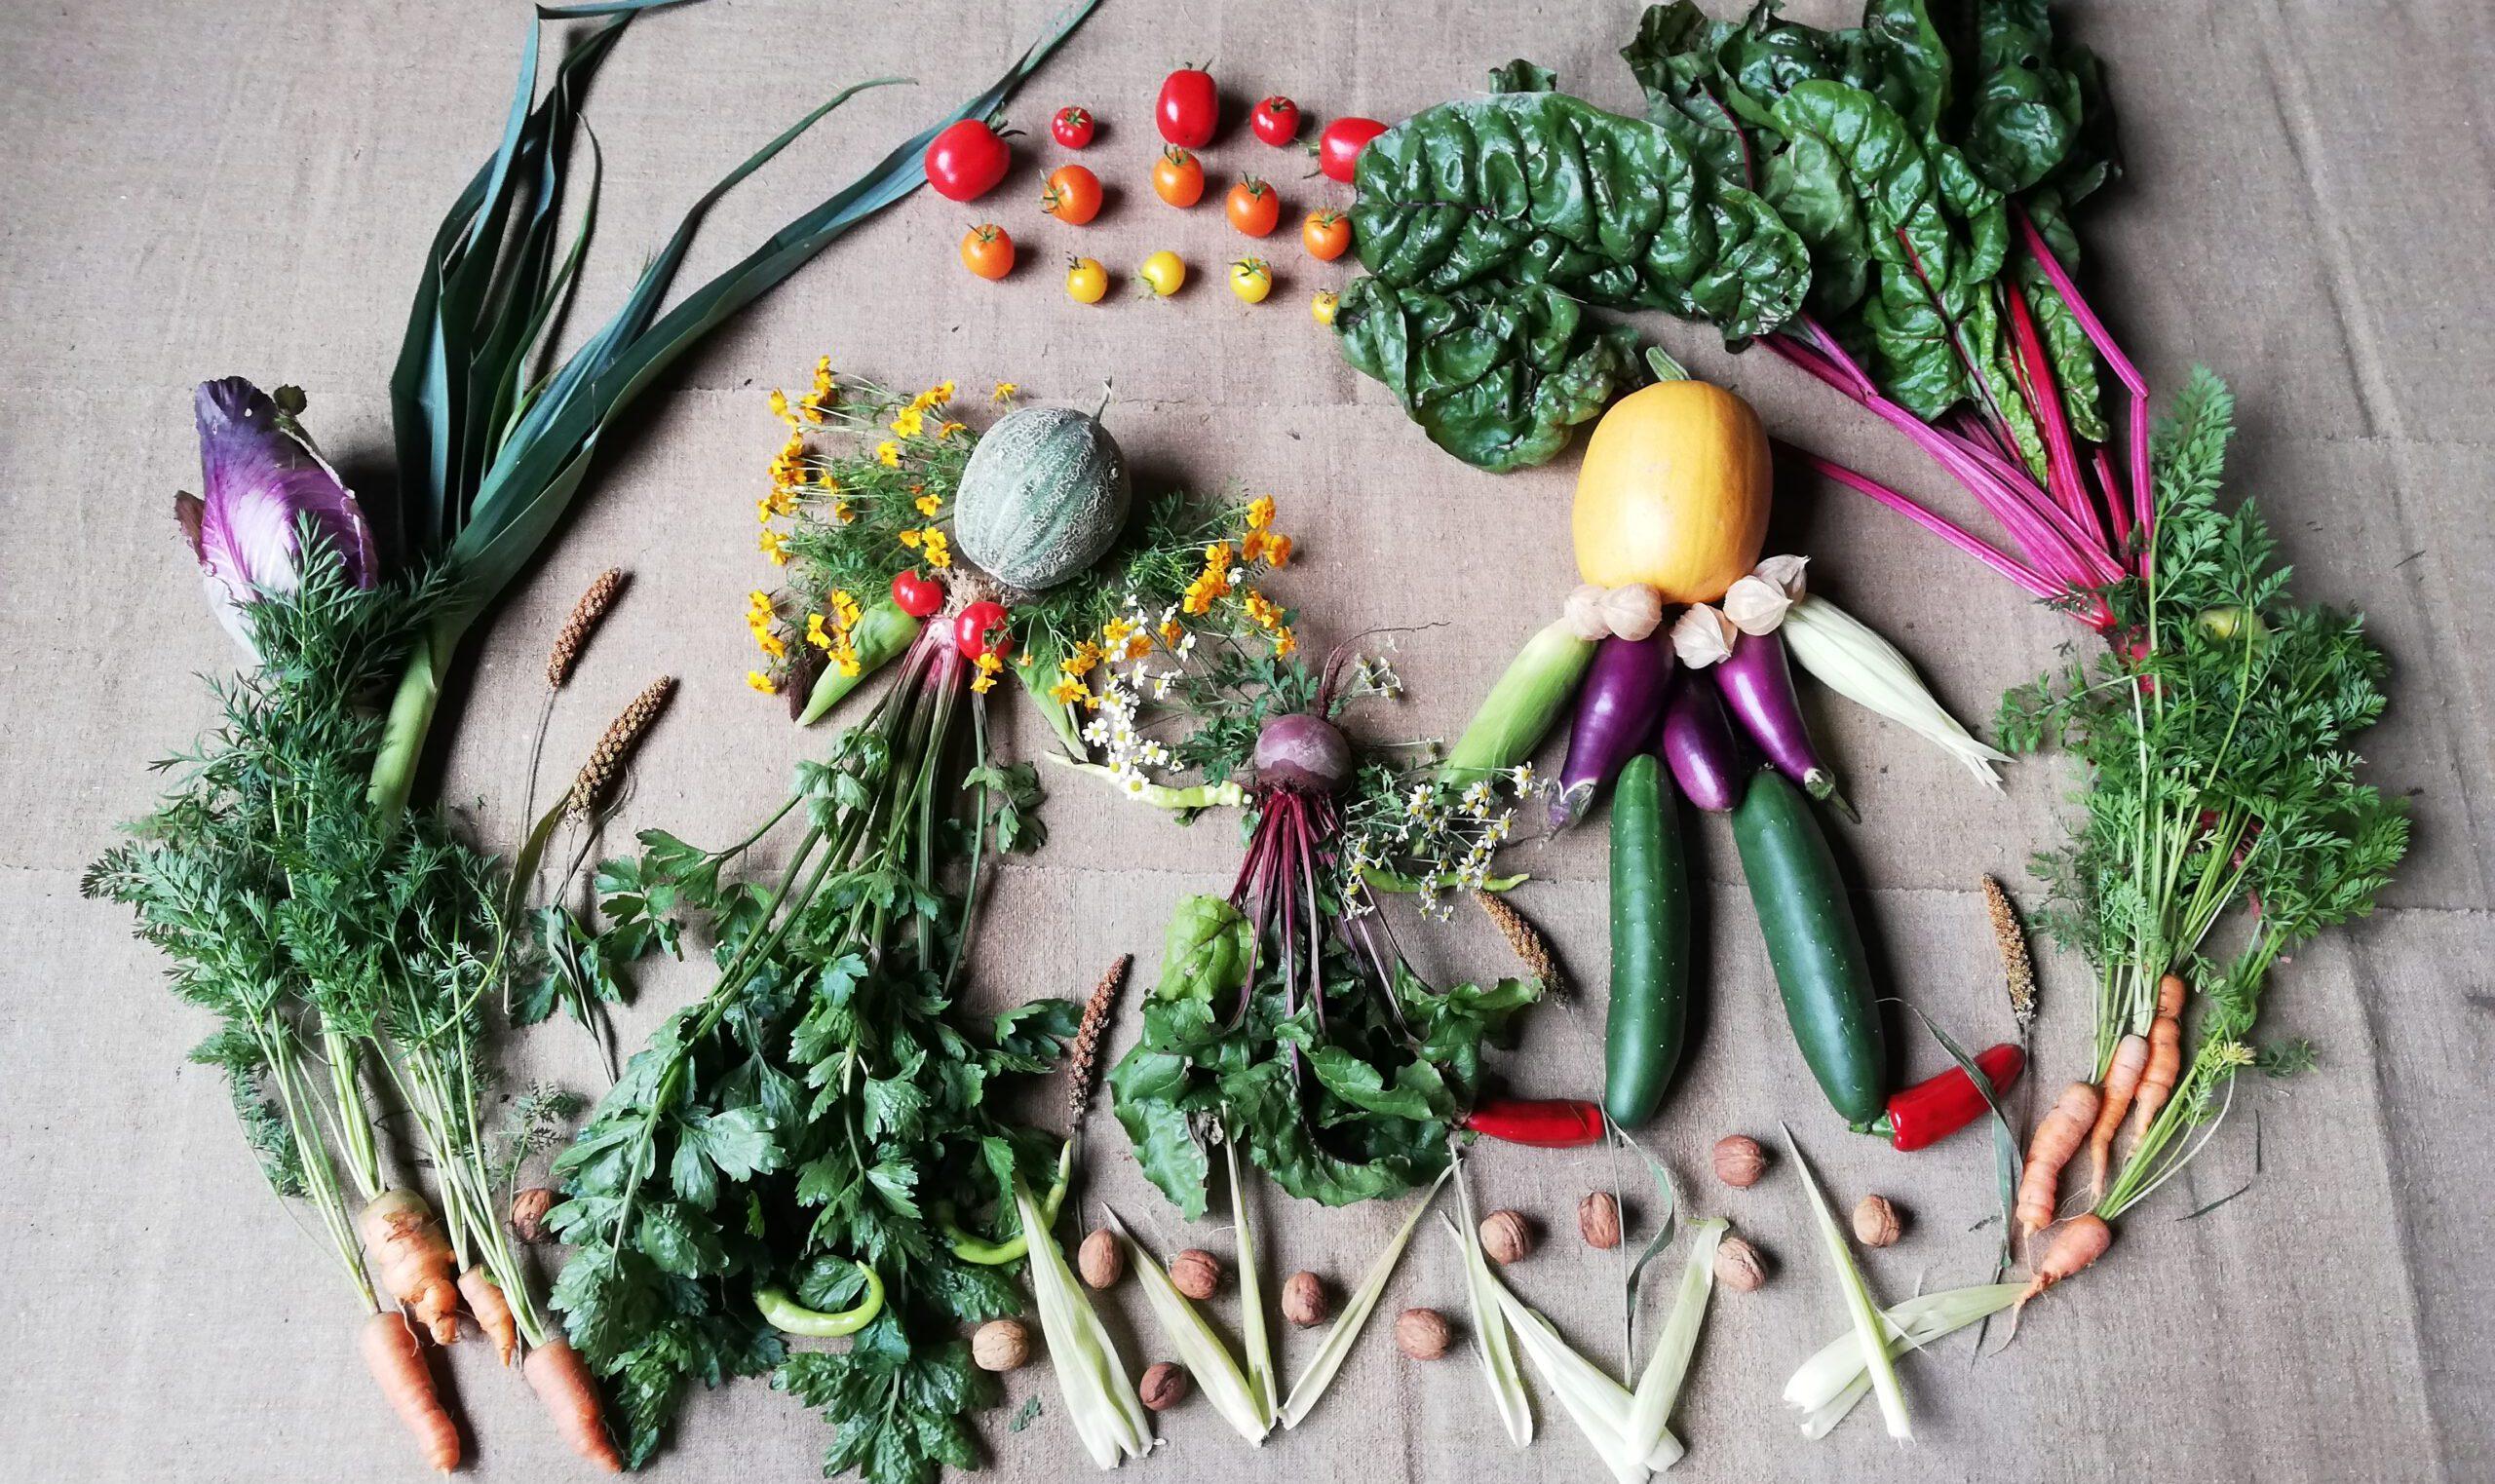 Die bunte Gemüsegemeinschaft aus dem Hunsrück